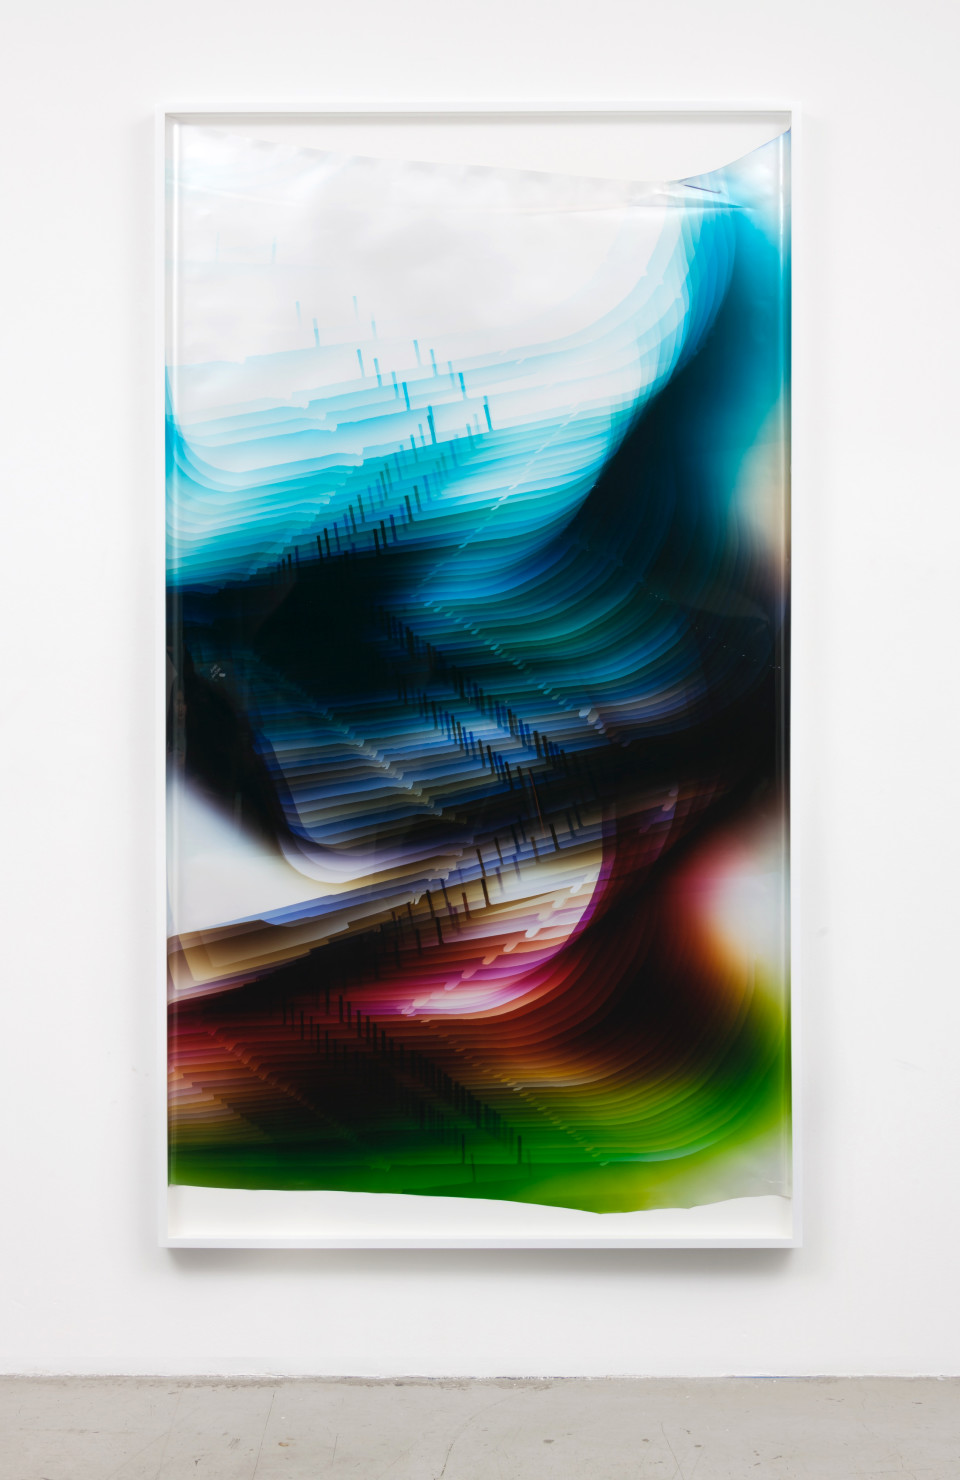 Image: Mariah Robertson  229, 2017  unique chromogenic print  87 x 49 inches (221 x 124.5 cm)